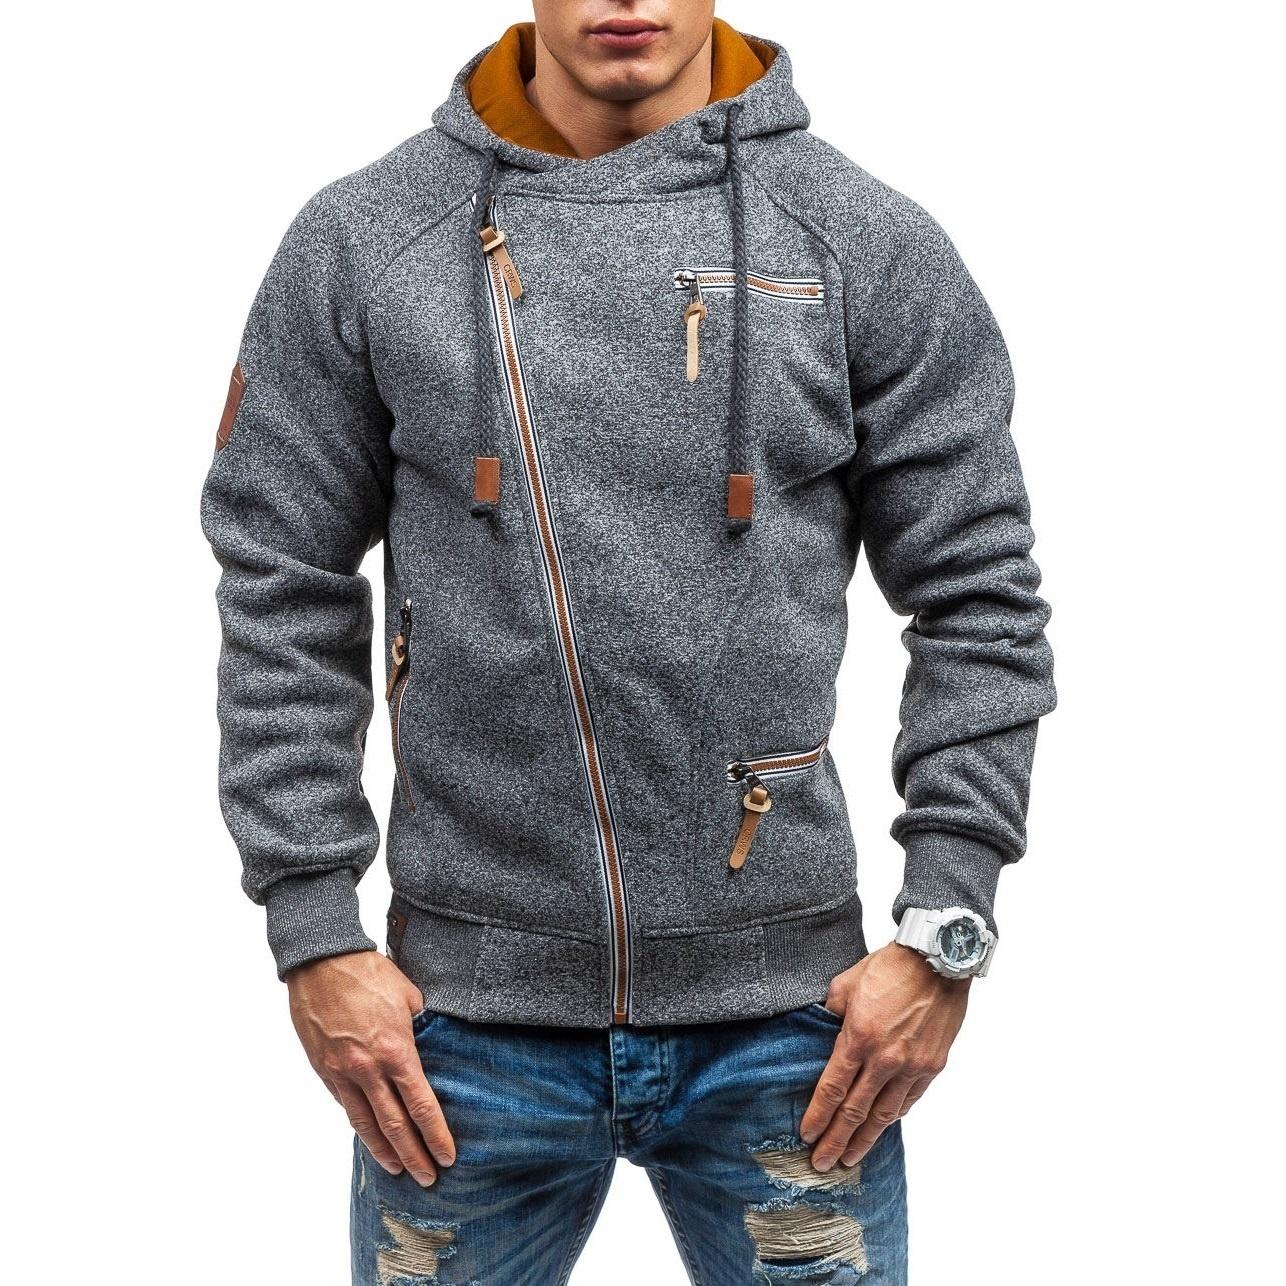 HTB18GyFXIfrK1Rjy1Xdq6yemFXaa - Men Hoodies Sweatshirt 2019 Spring New Unique Diagonal Zipper Fashion Simple Loose Casual Hooded Streetwear Men Tracksuits Coat